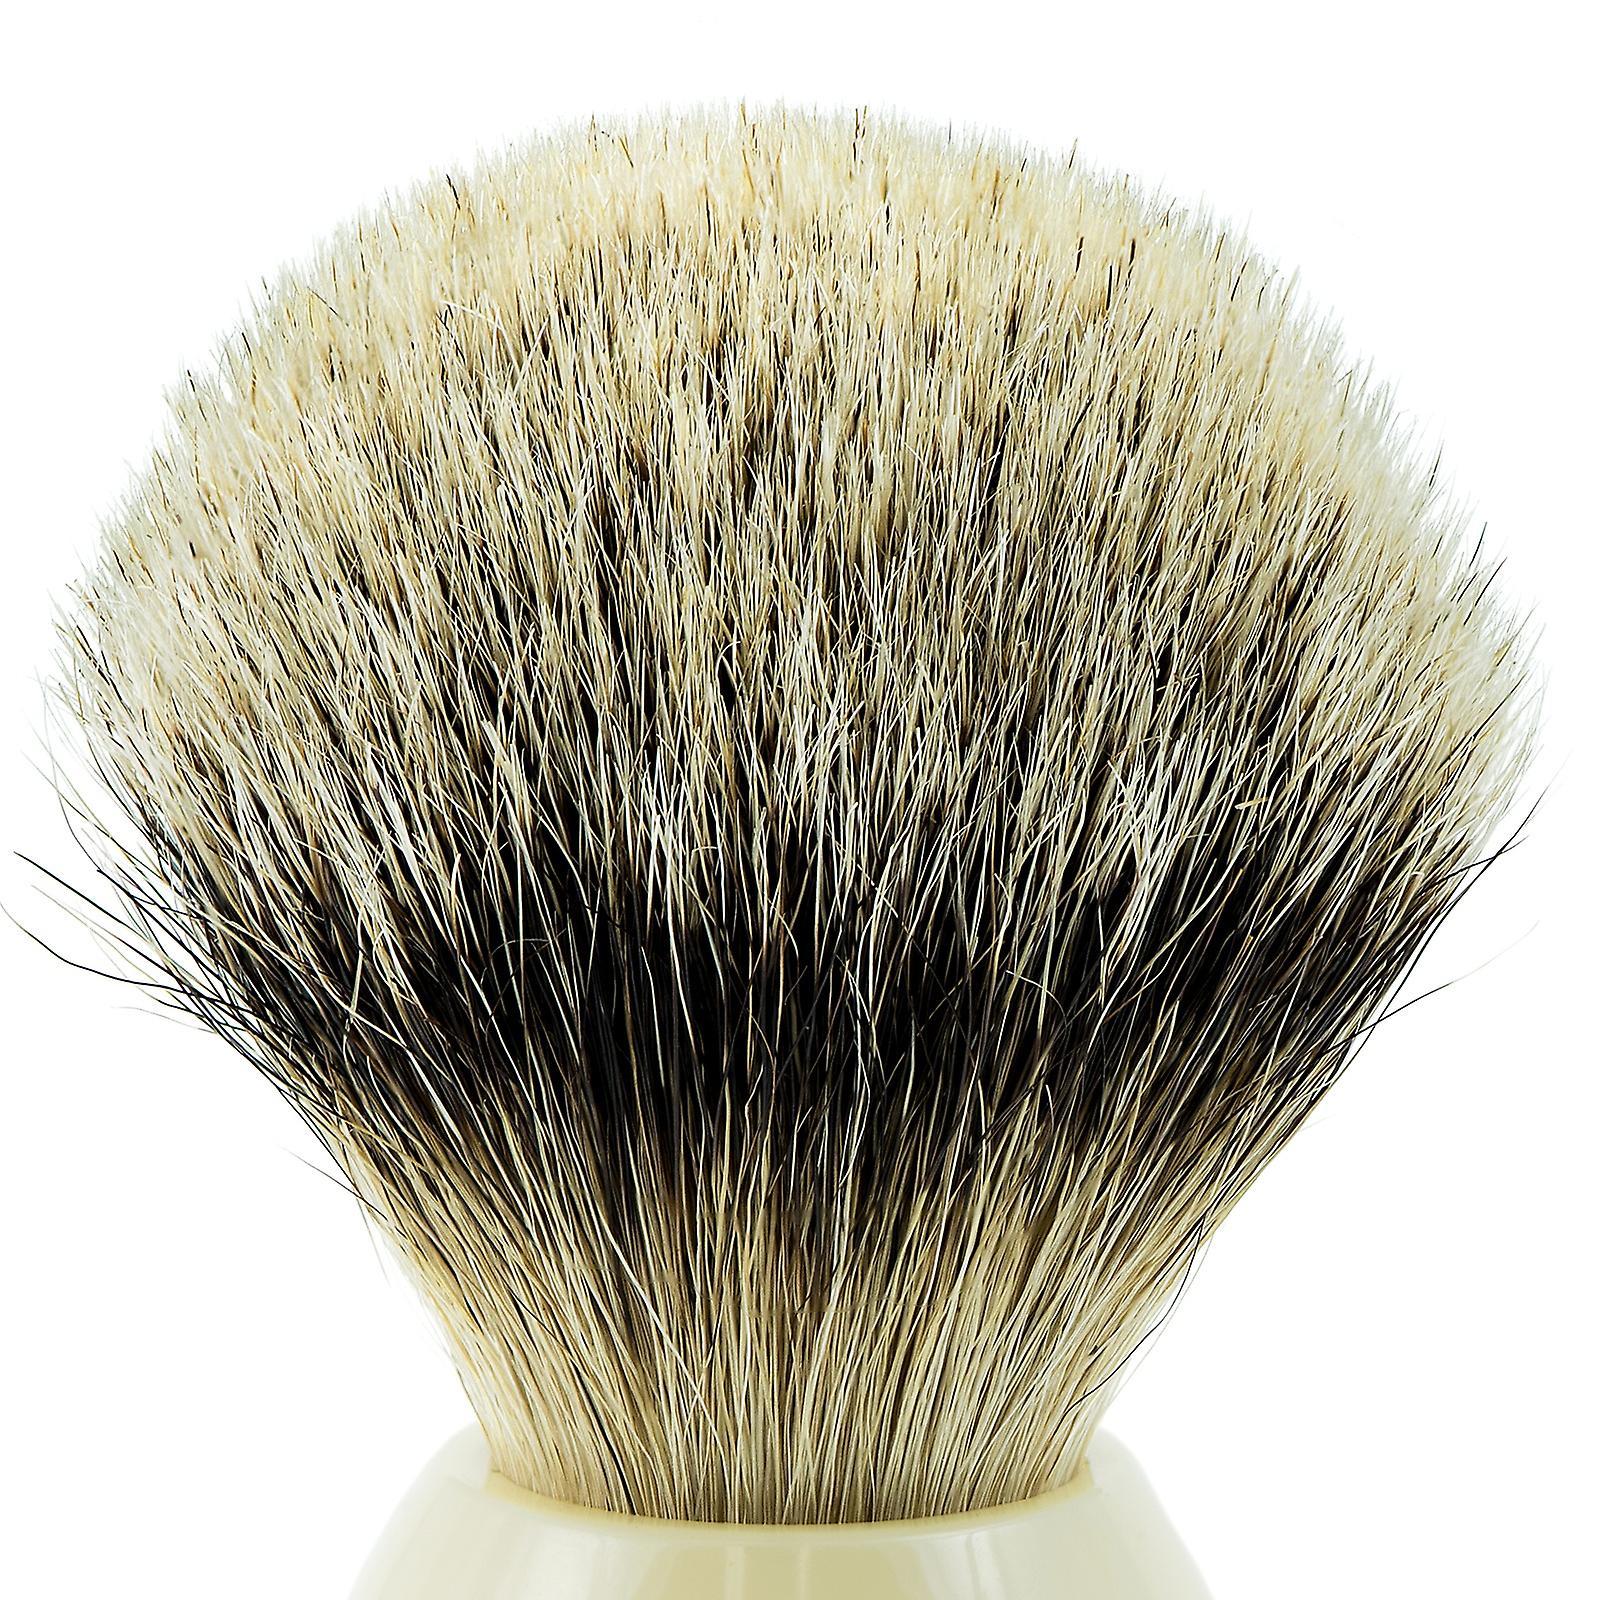 Da Vinci UOMO 294 Silvertip Badger Shaving Brush   ø22mm